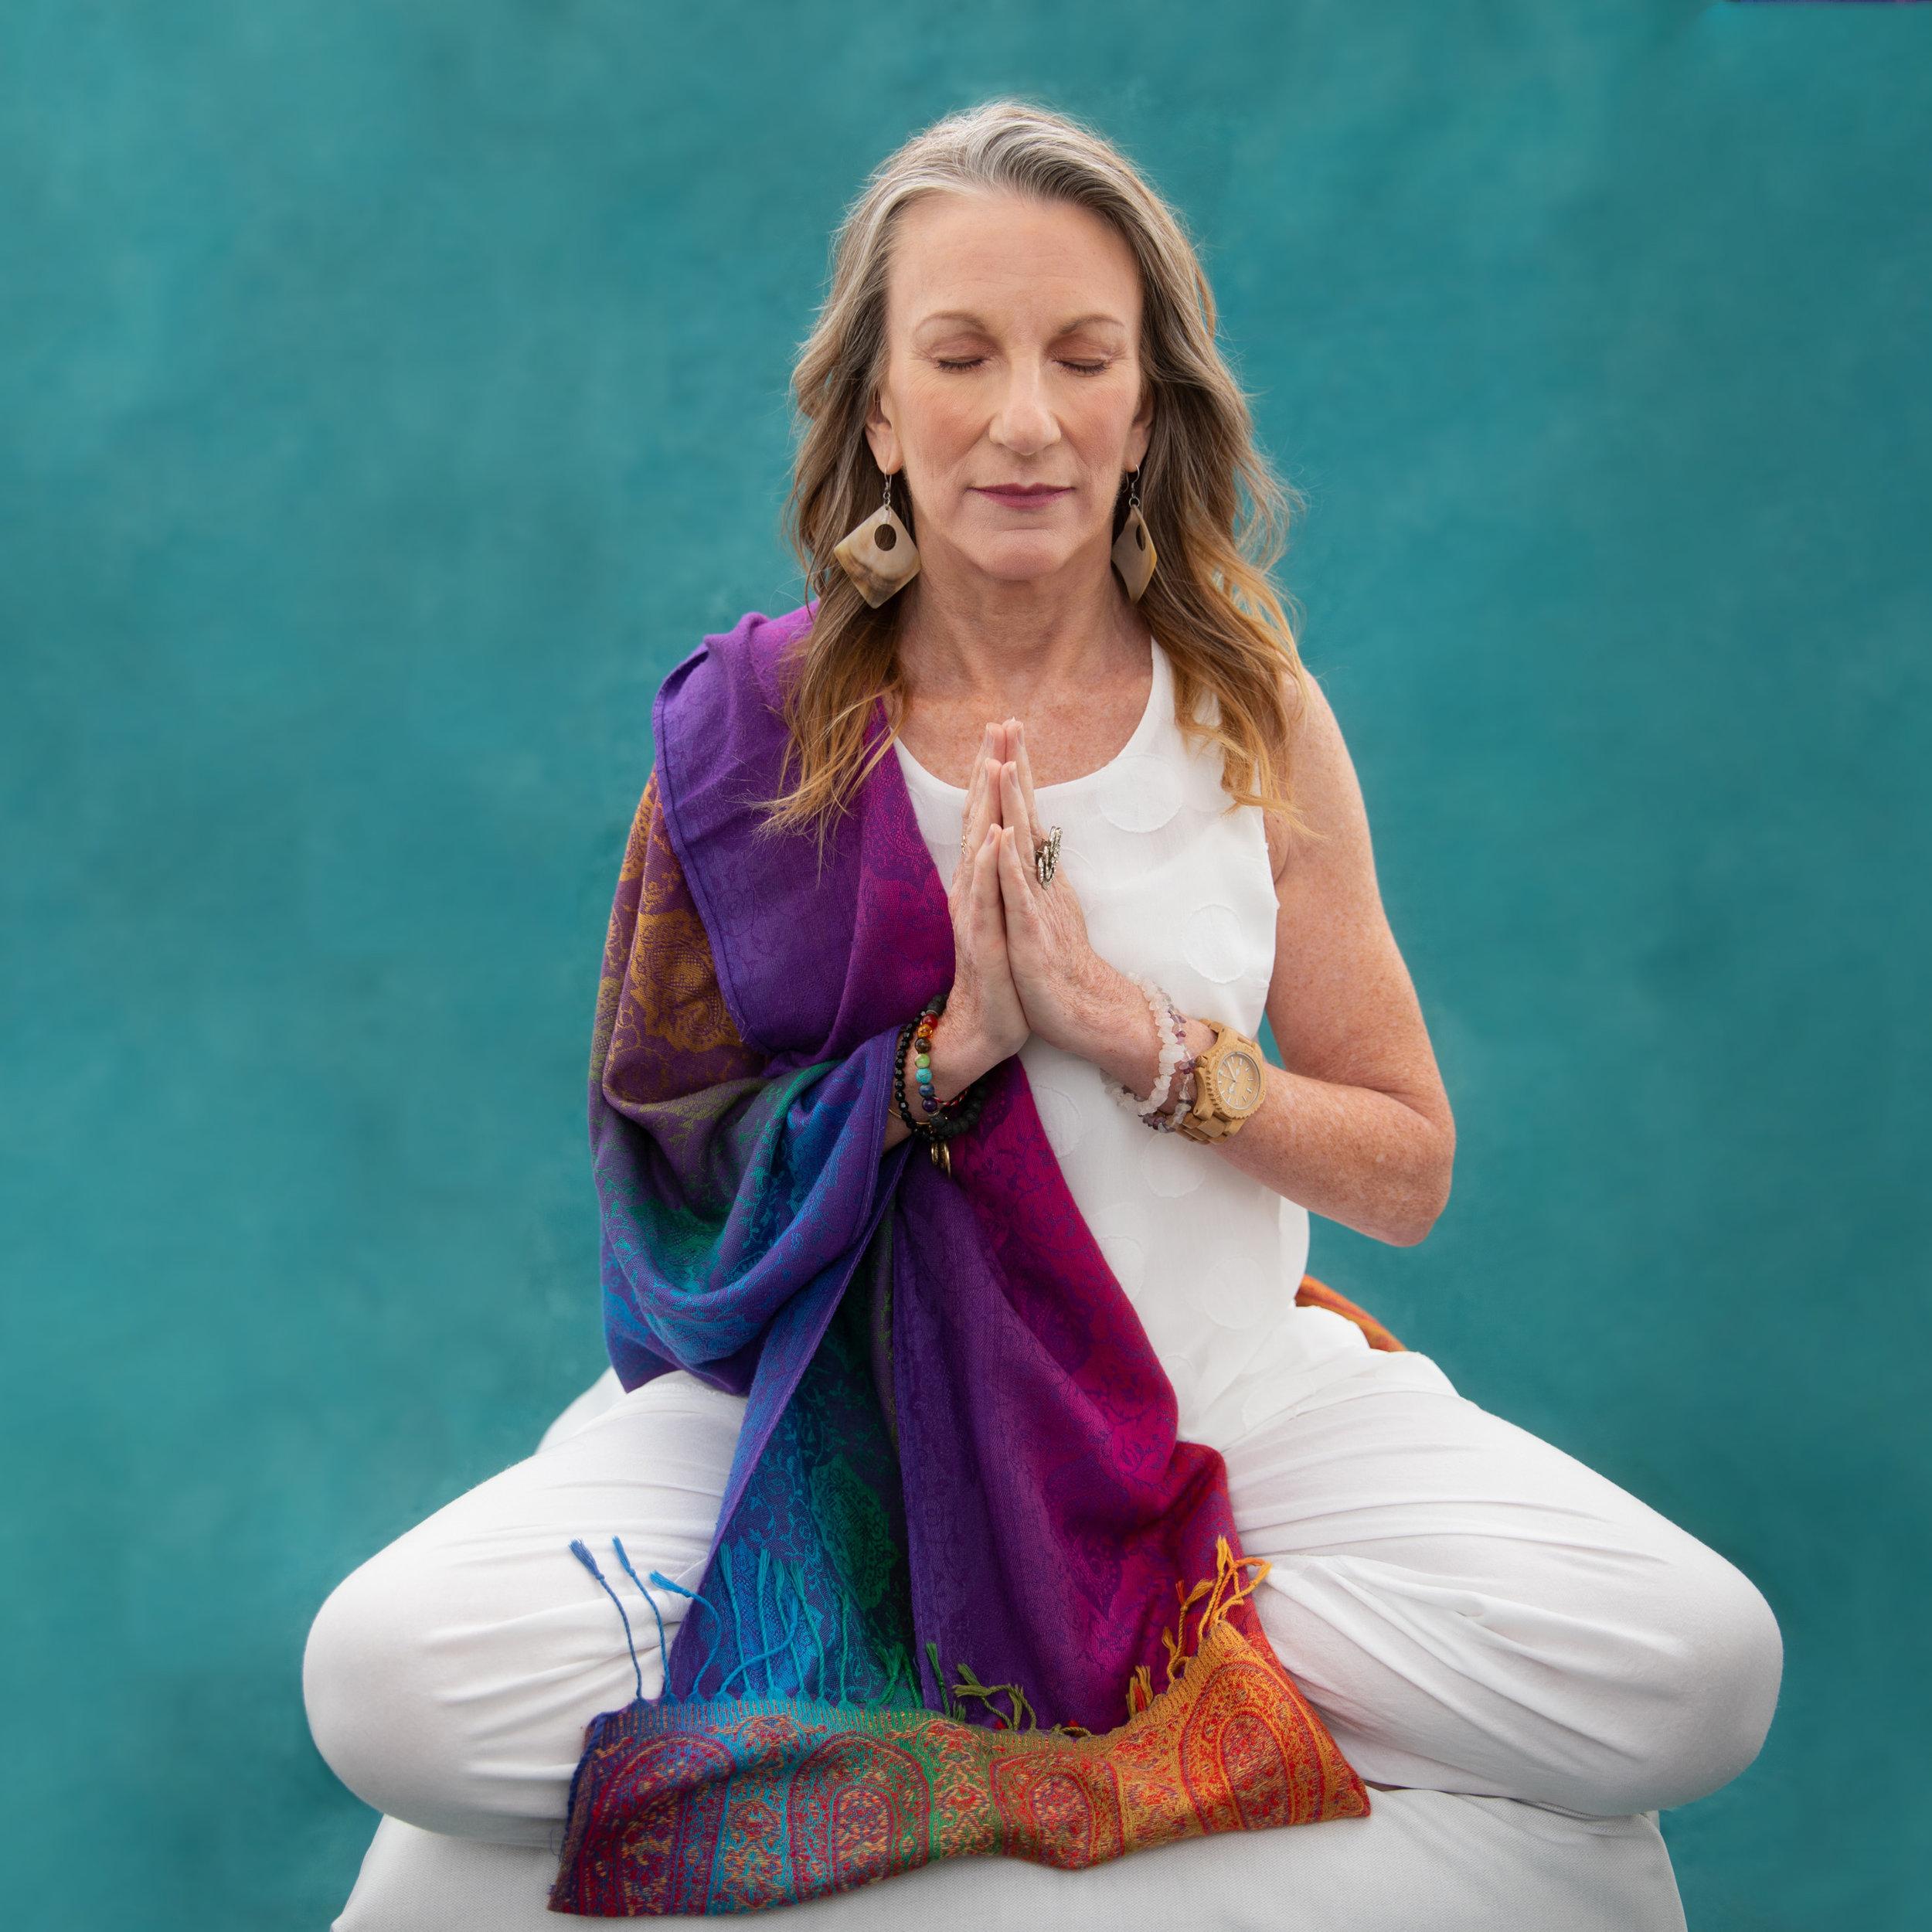 Meditation square crop.jpg